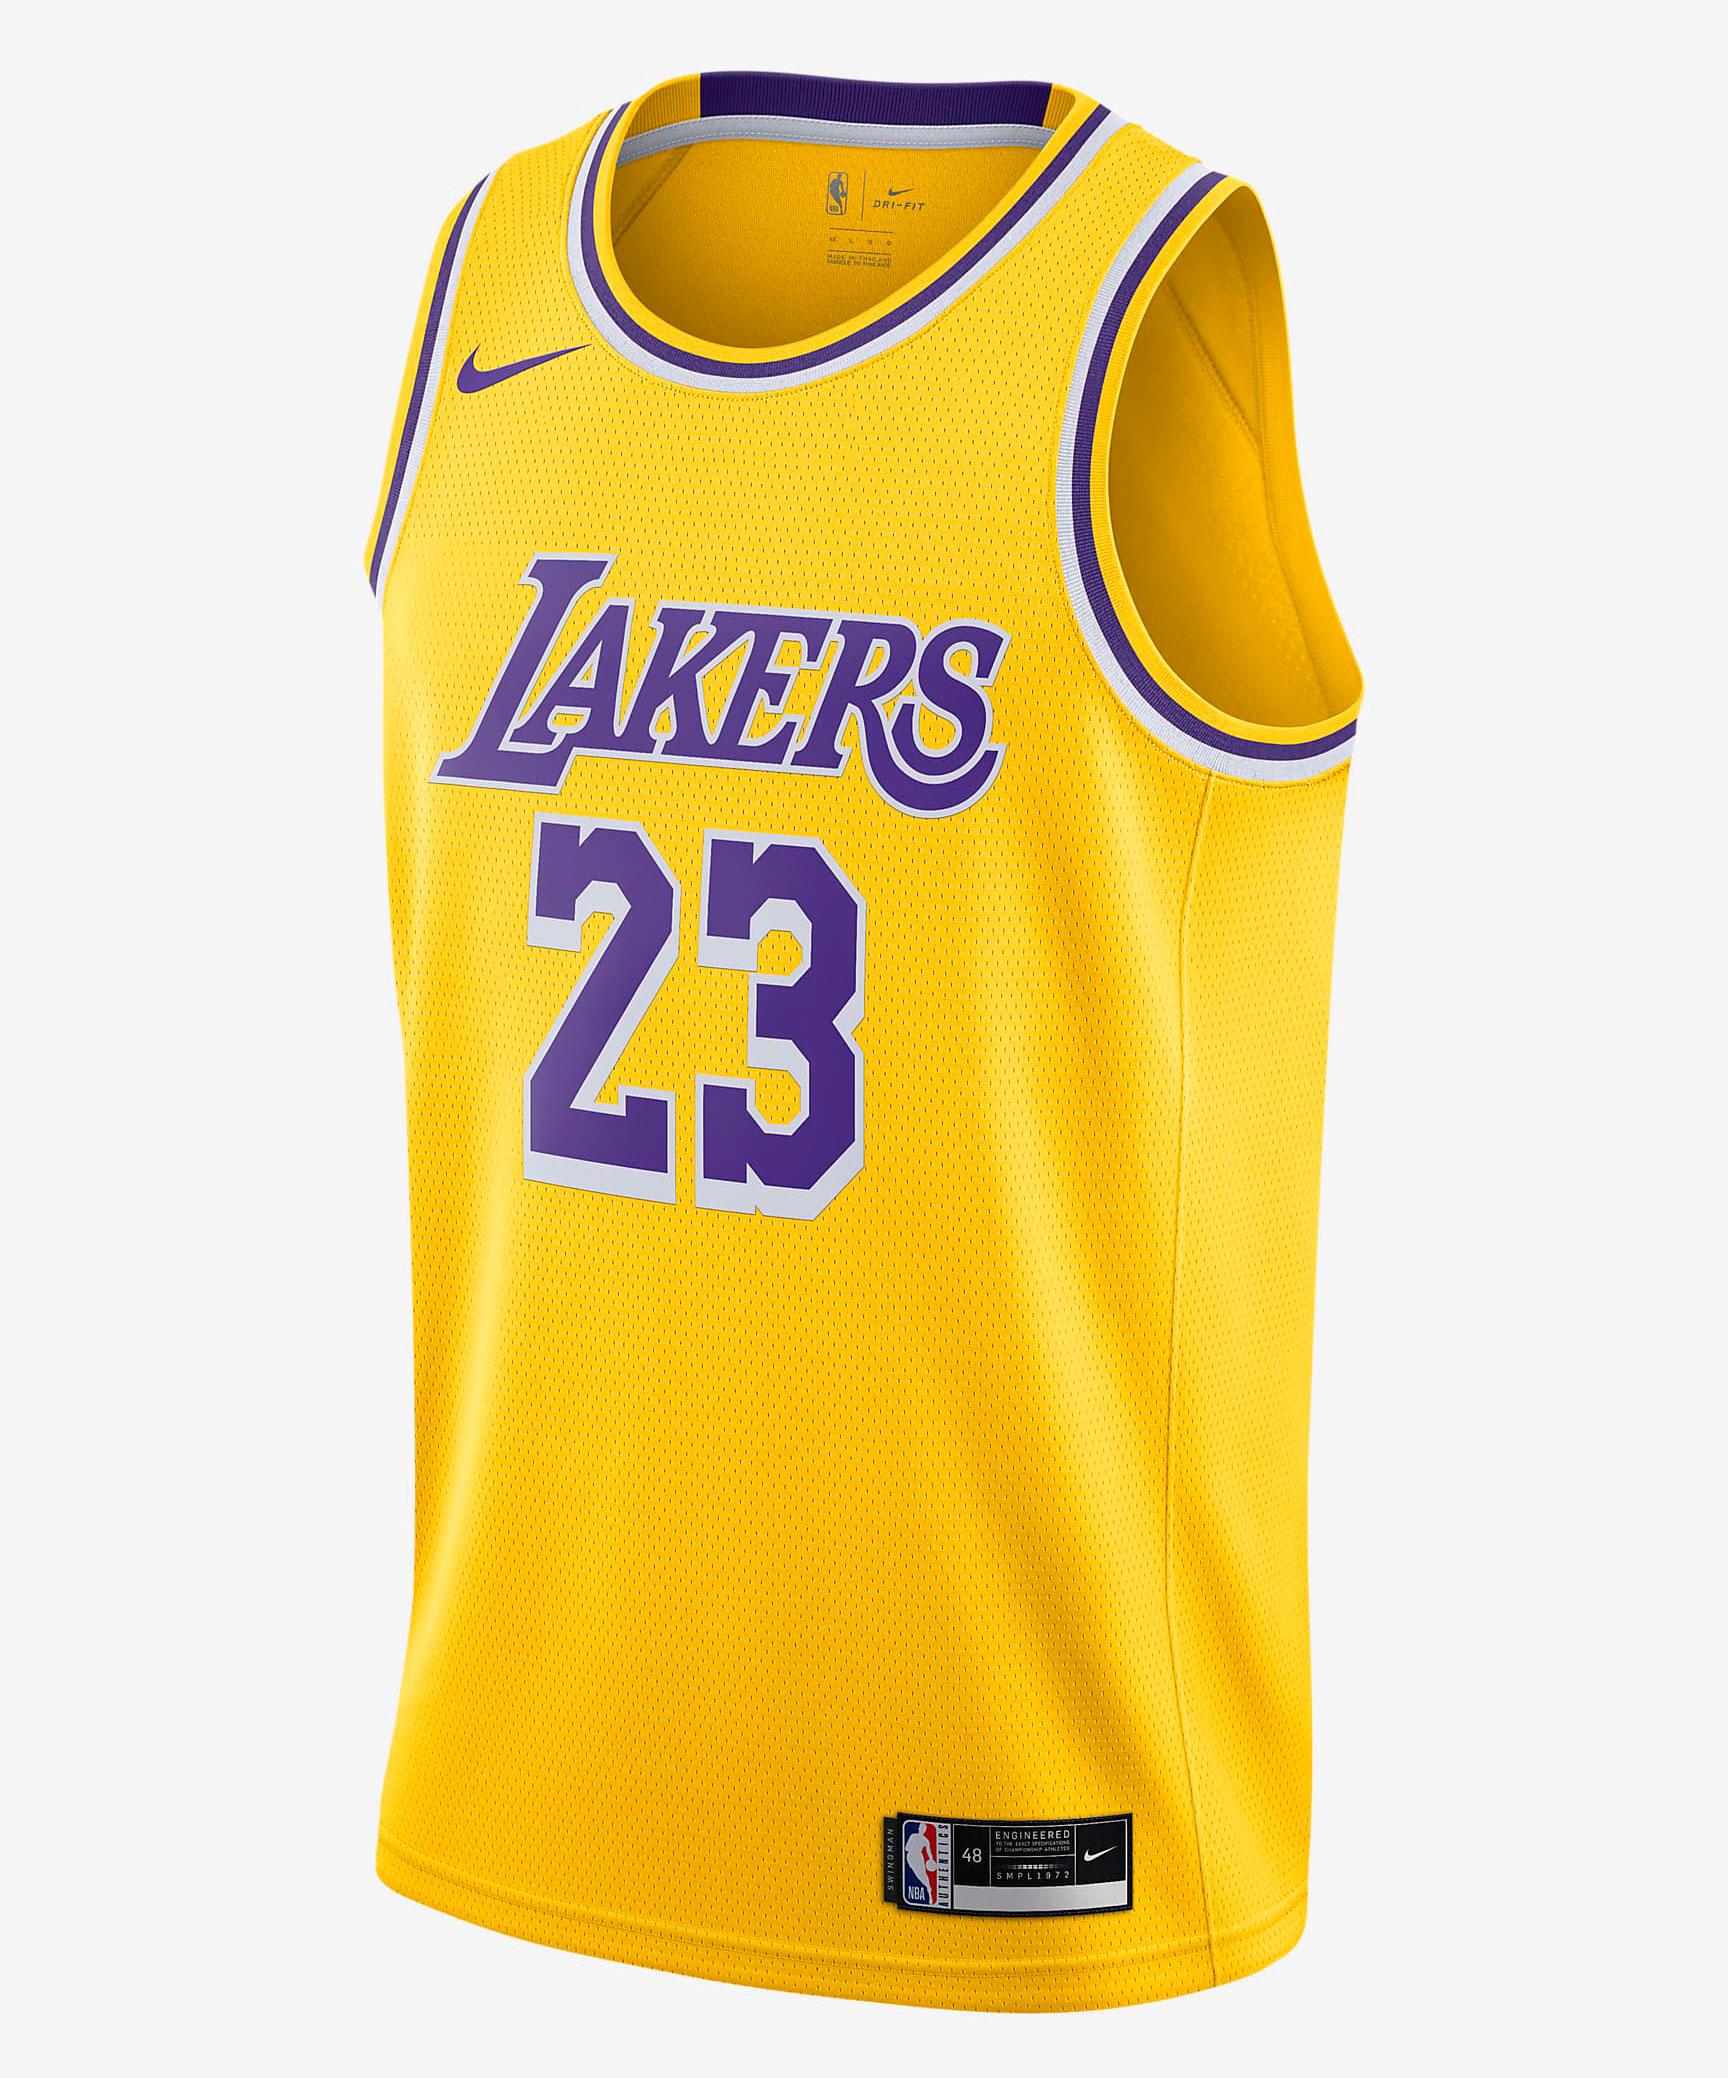 nike-lebron-18-lakers-nike-jersey-gold-yellow-1